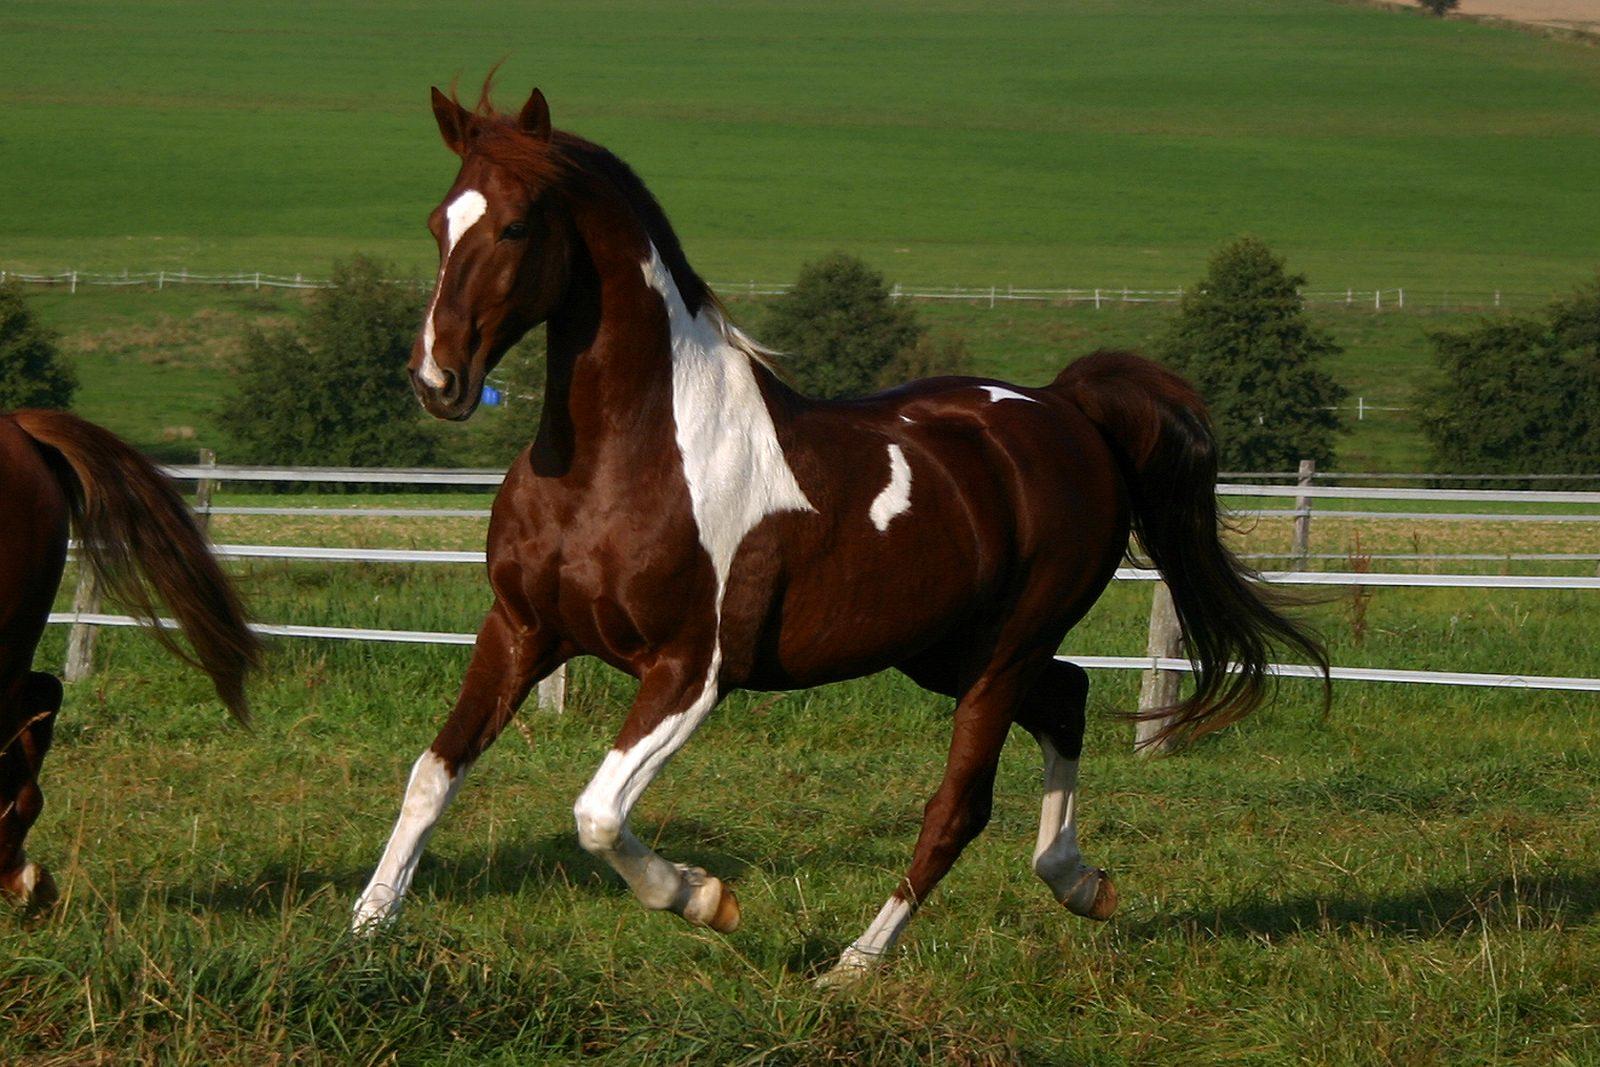 Lesiones tras caídas de caballo